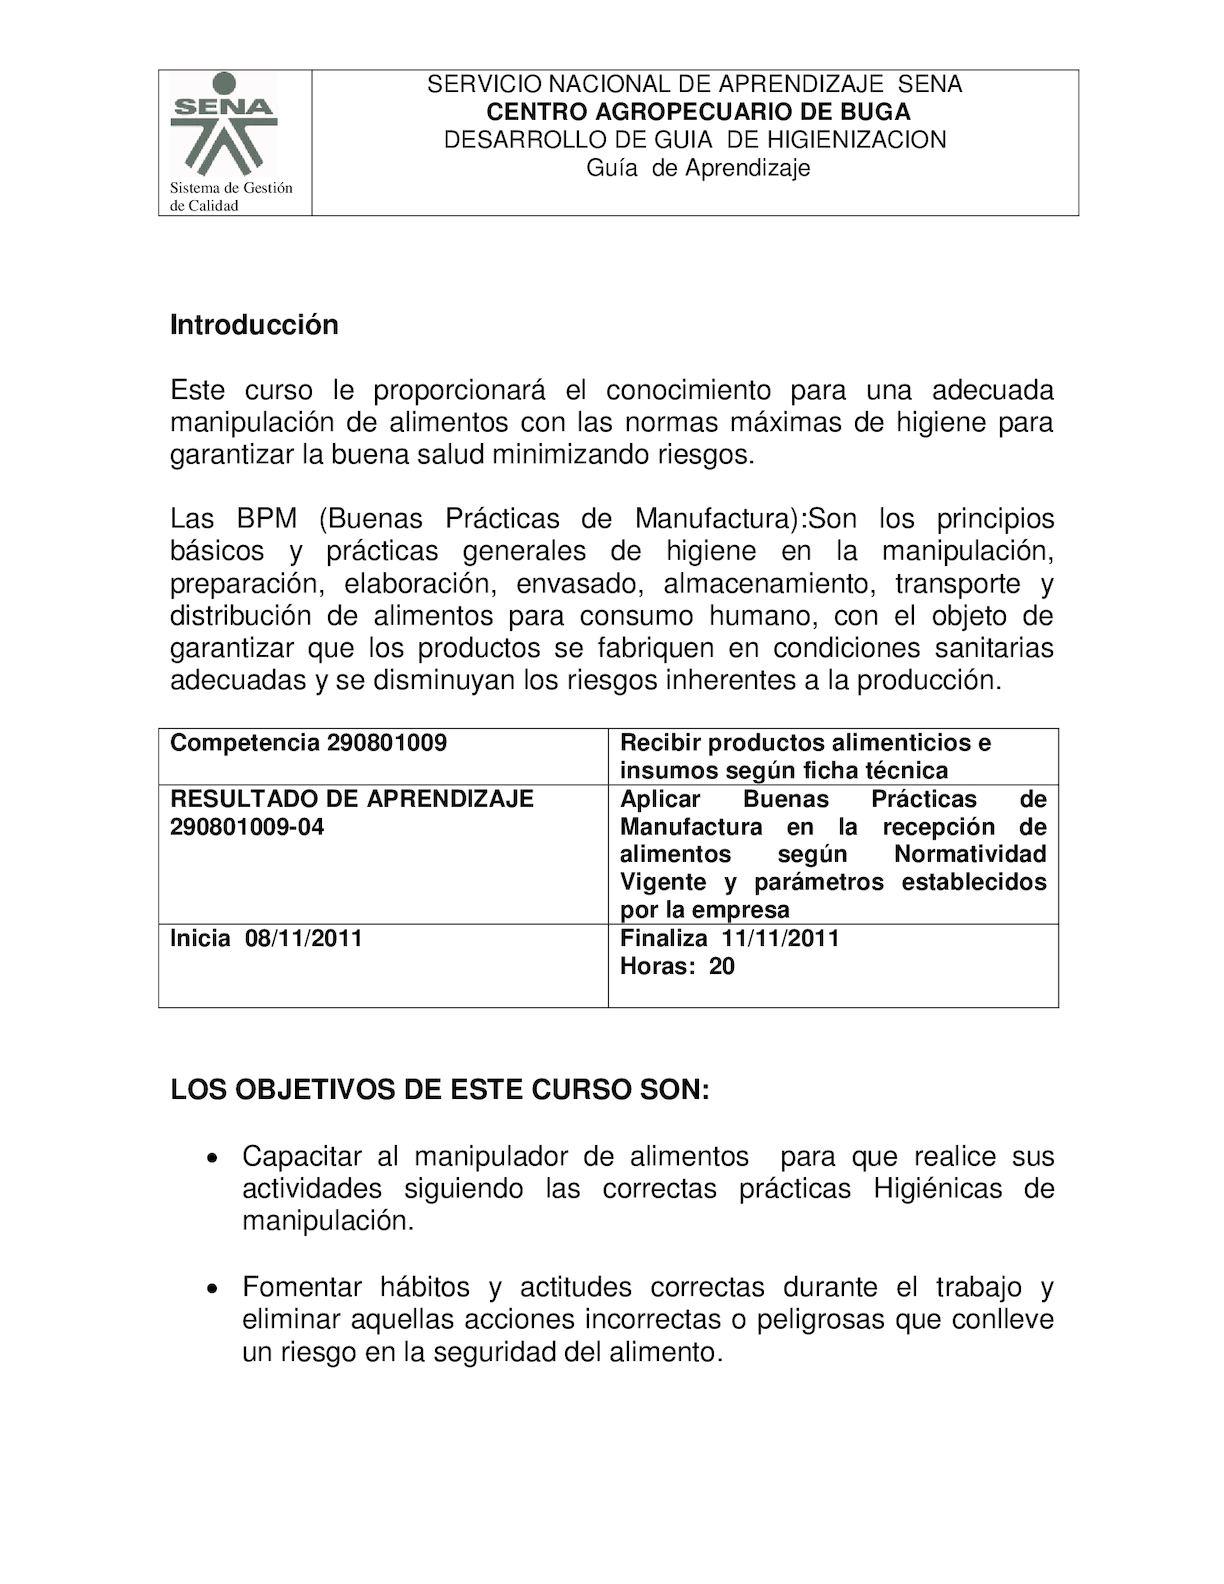 Calam o documents mx guia higiene y manipulacion for Higiene y manipulacion de alimentos pdf